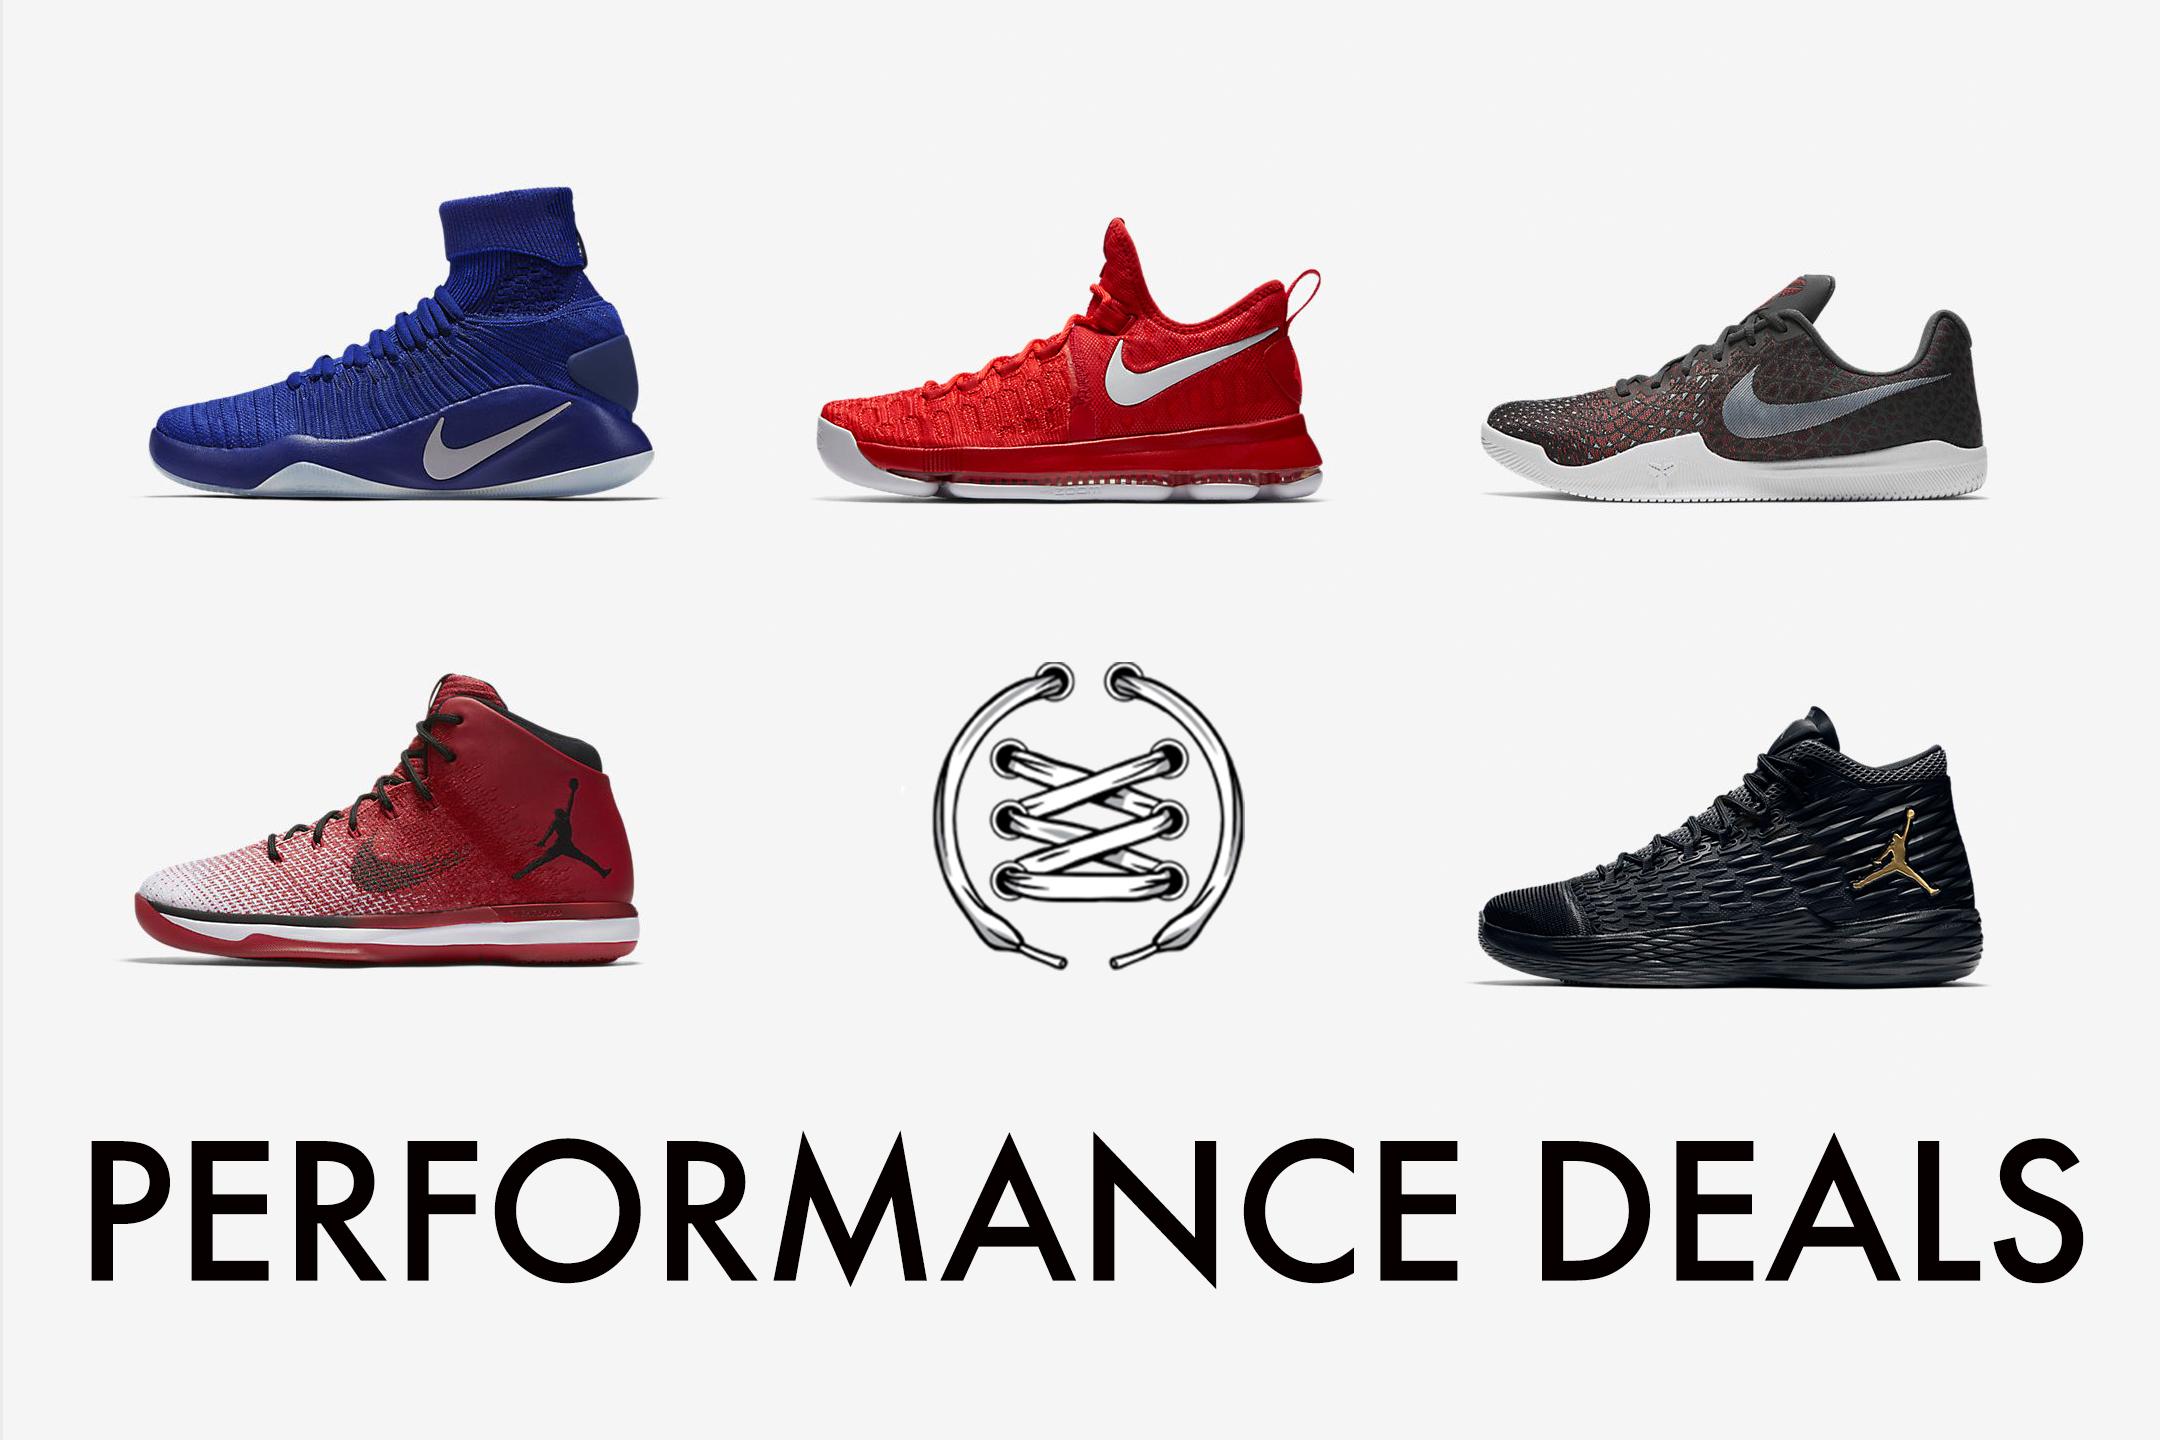 sports shoes a3435 b8d1f kicks deals Archives - WearTesters